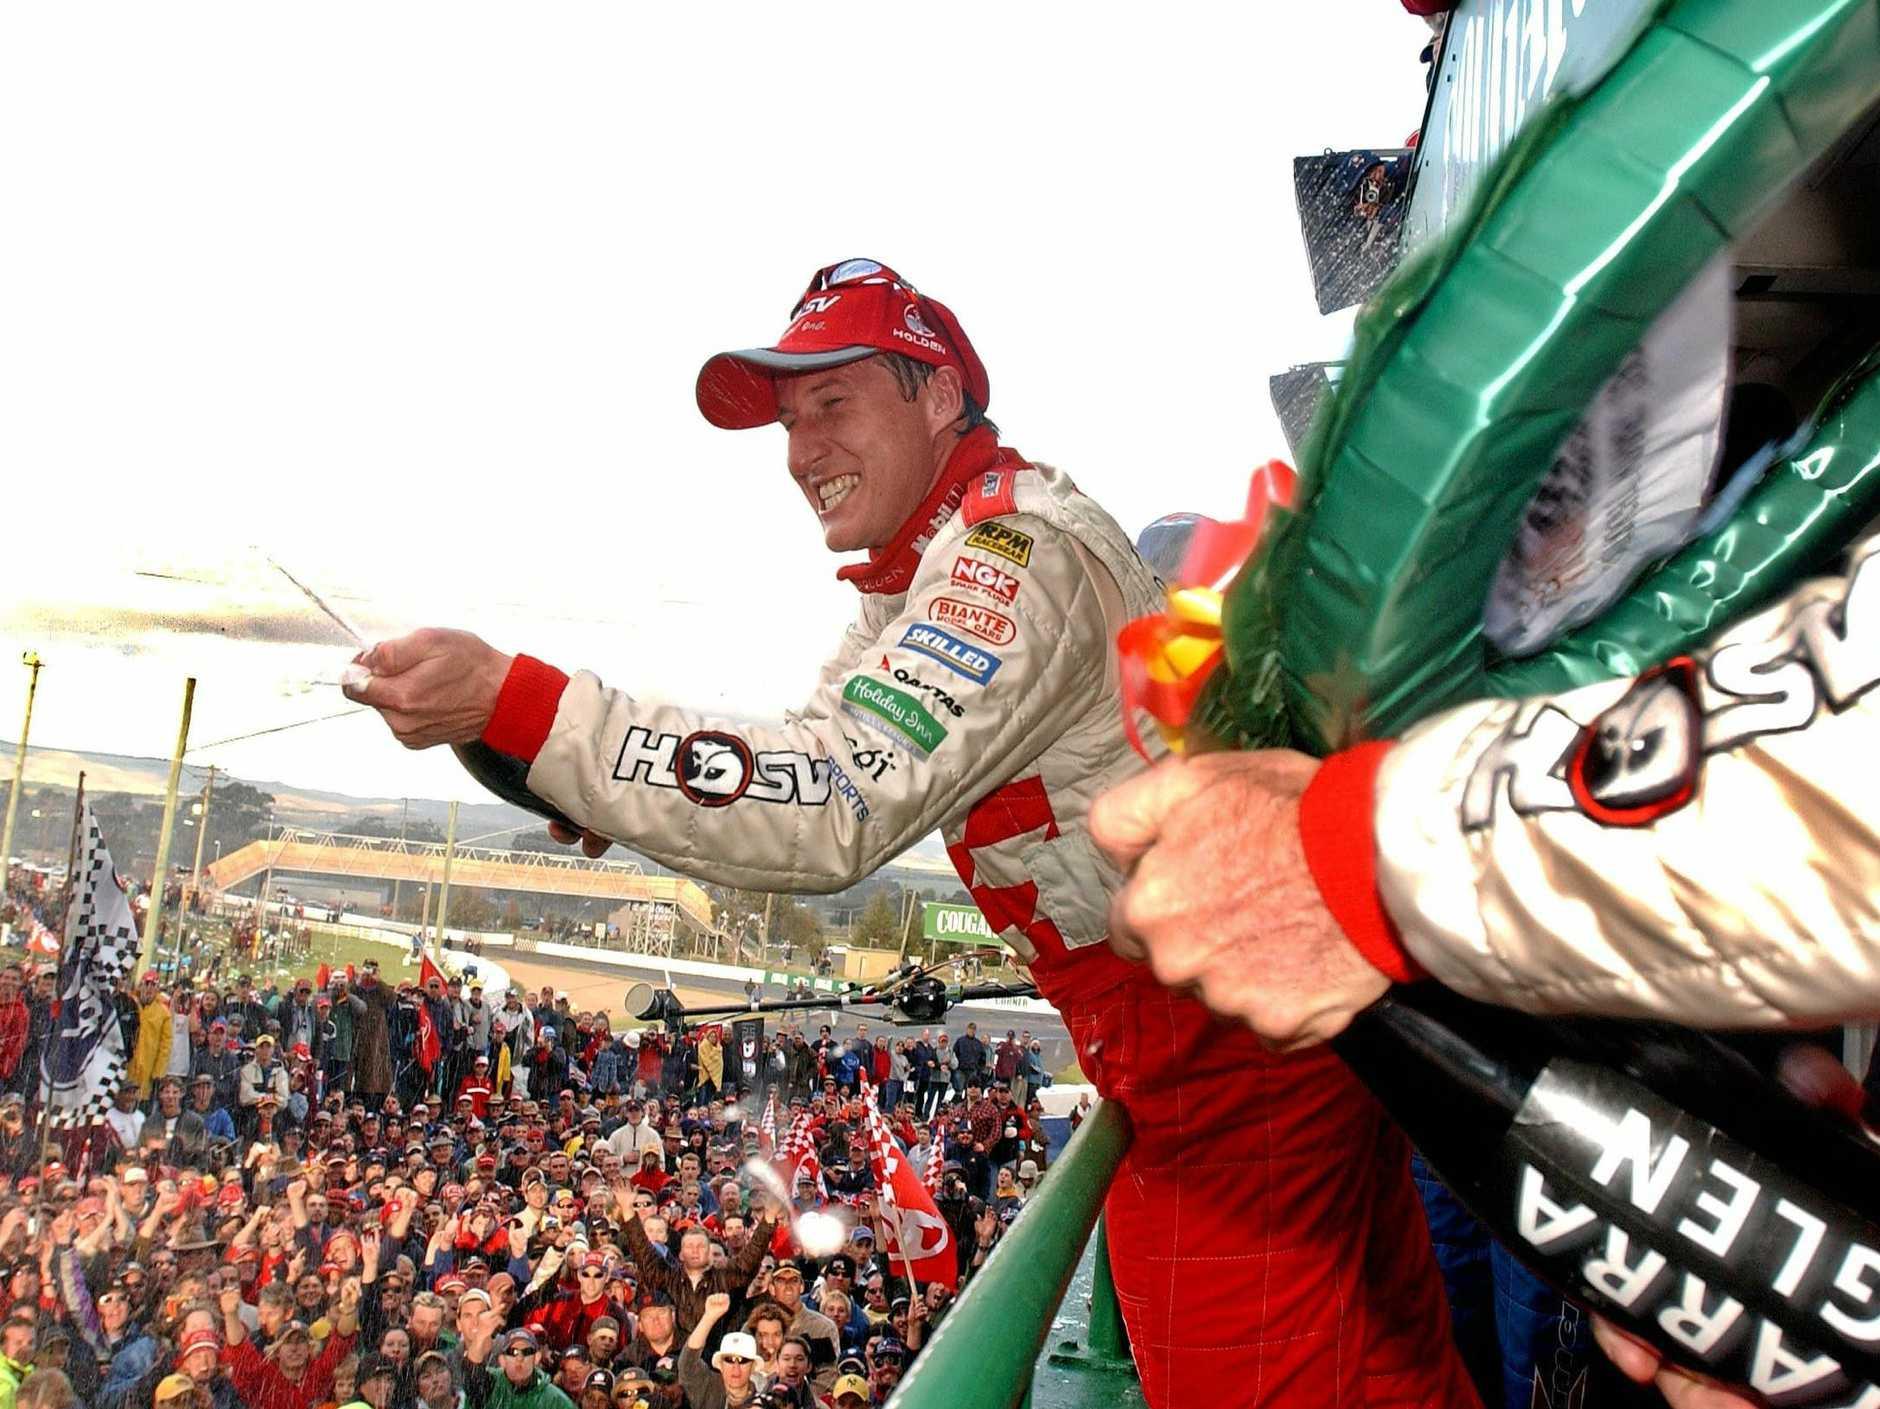 07 Oct 2001:  Mark Skaife of the Holden Racing team sprays champagne after taking victory in the Bathurst 1000 V8 Supercar race held at Mt Panormama, Bathurst, Australia.  DIGITAL IMAGE Mandatory Credit: Chris McGrath/ALLSPORT